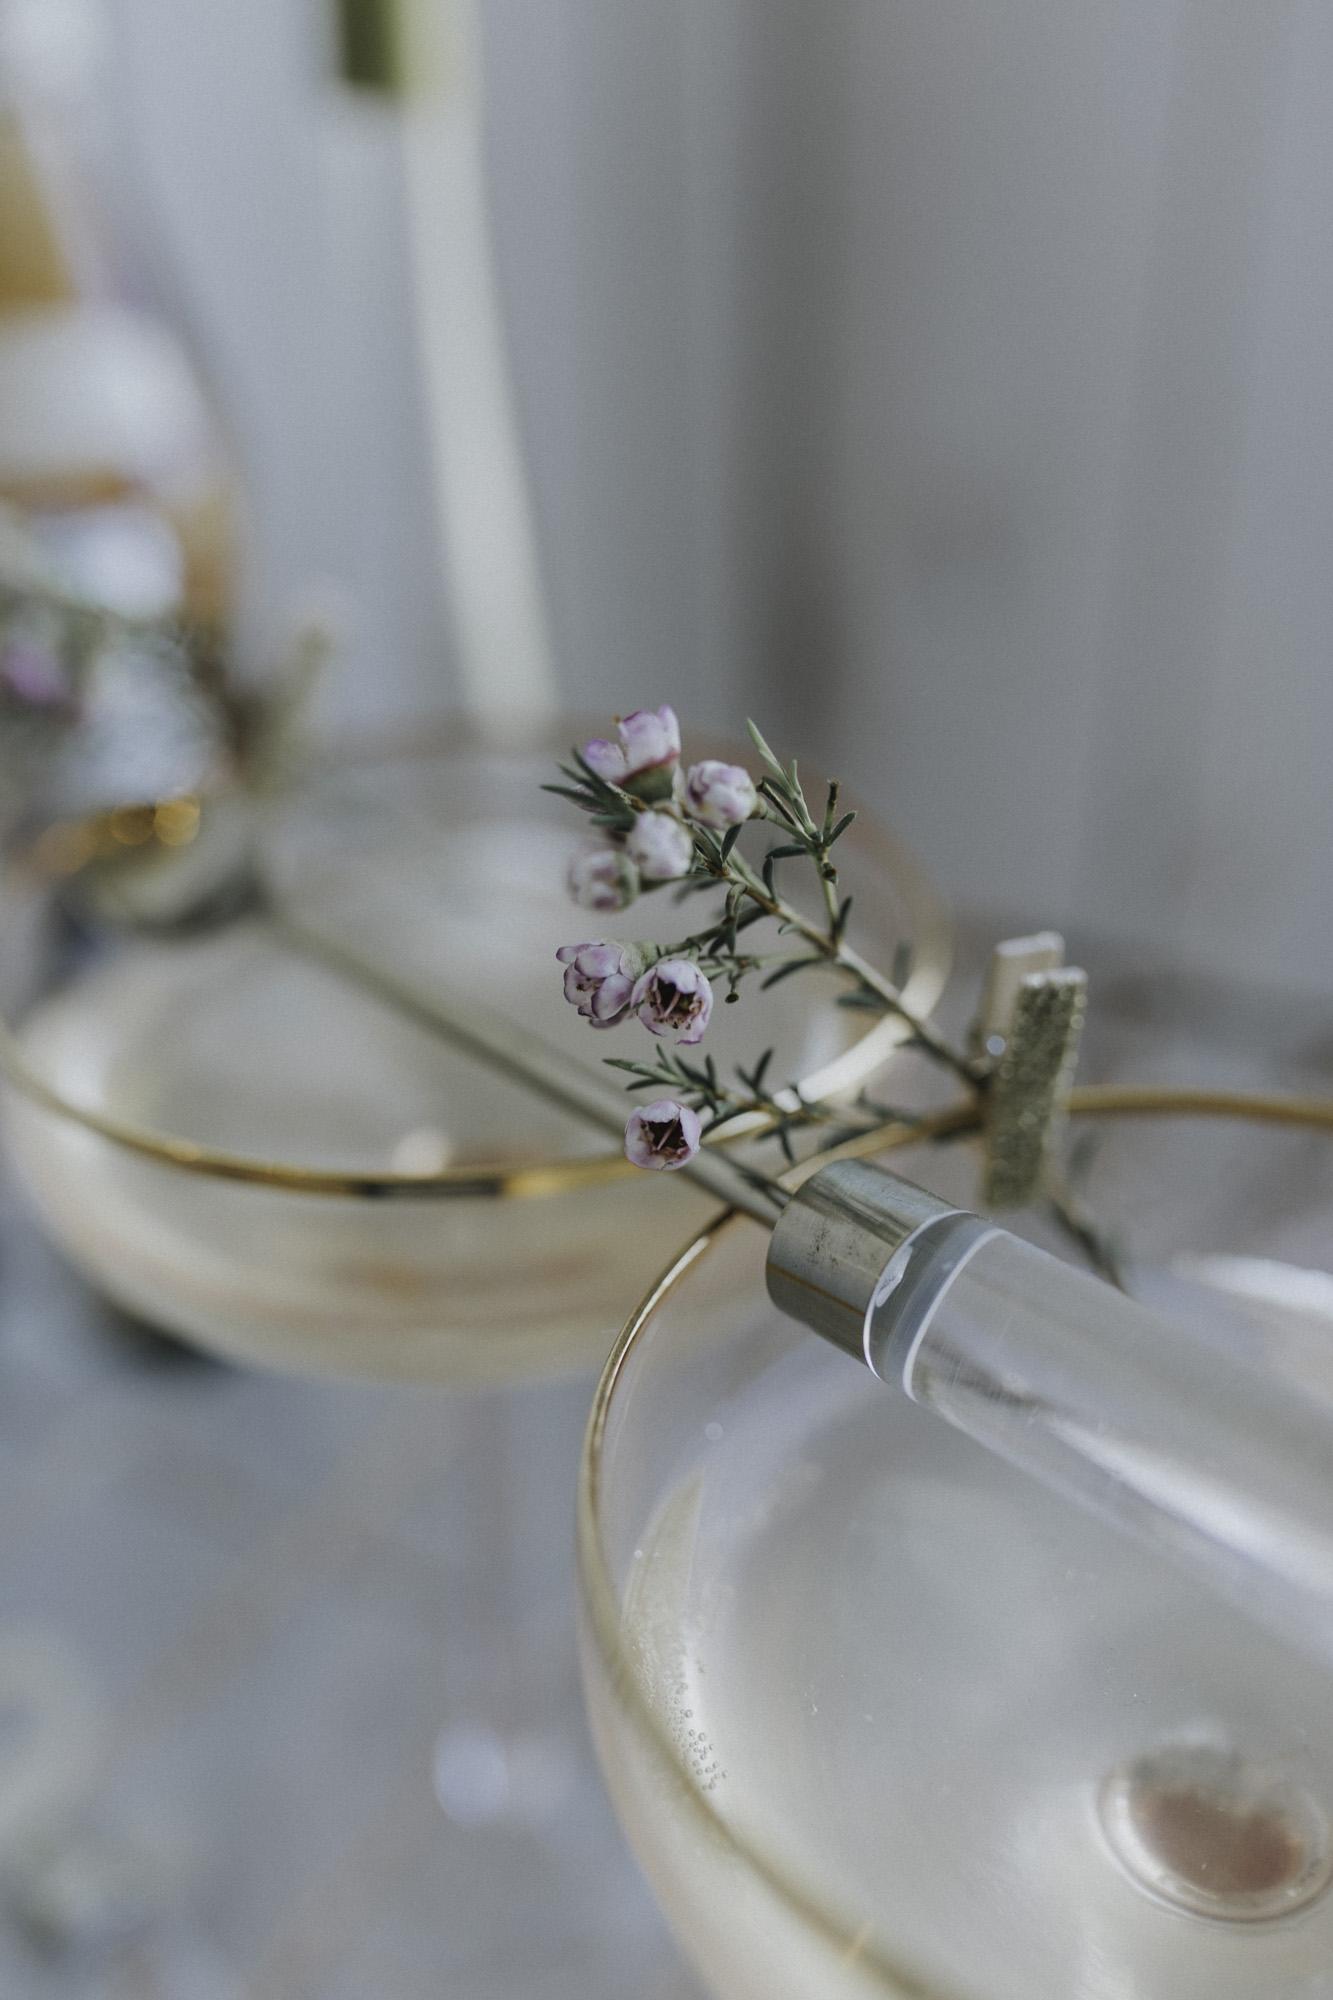 Cate_Ann_Photography_Dayton_Ohio_Wedding_Elopement_And_Engagement_PhotographerIMG_7866.jpg